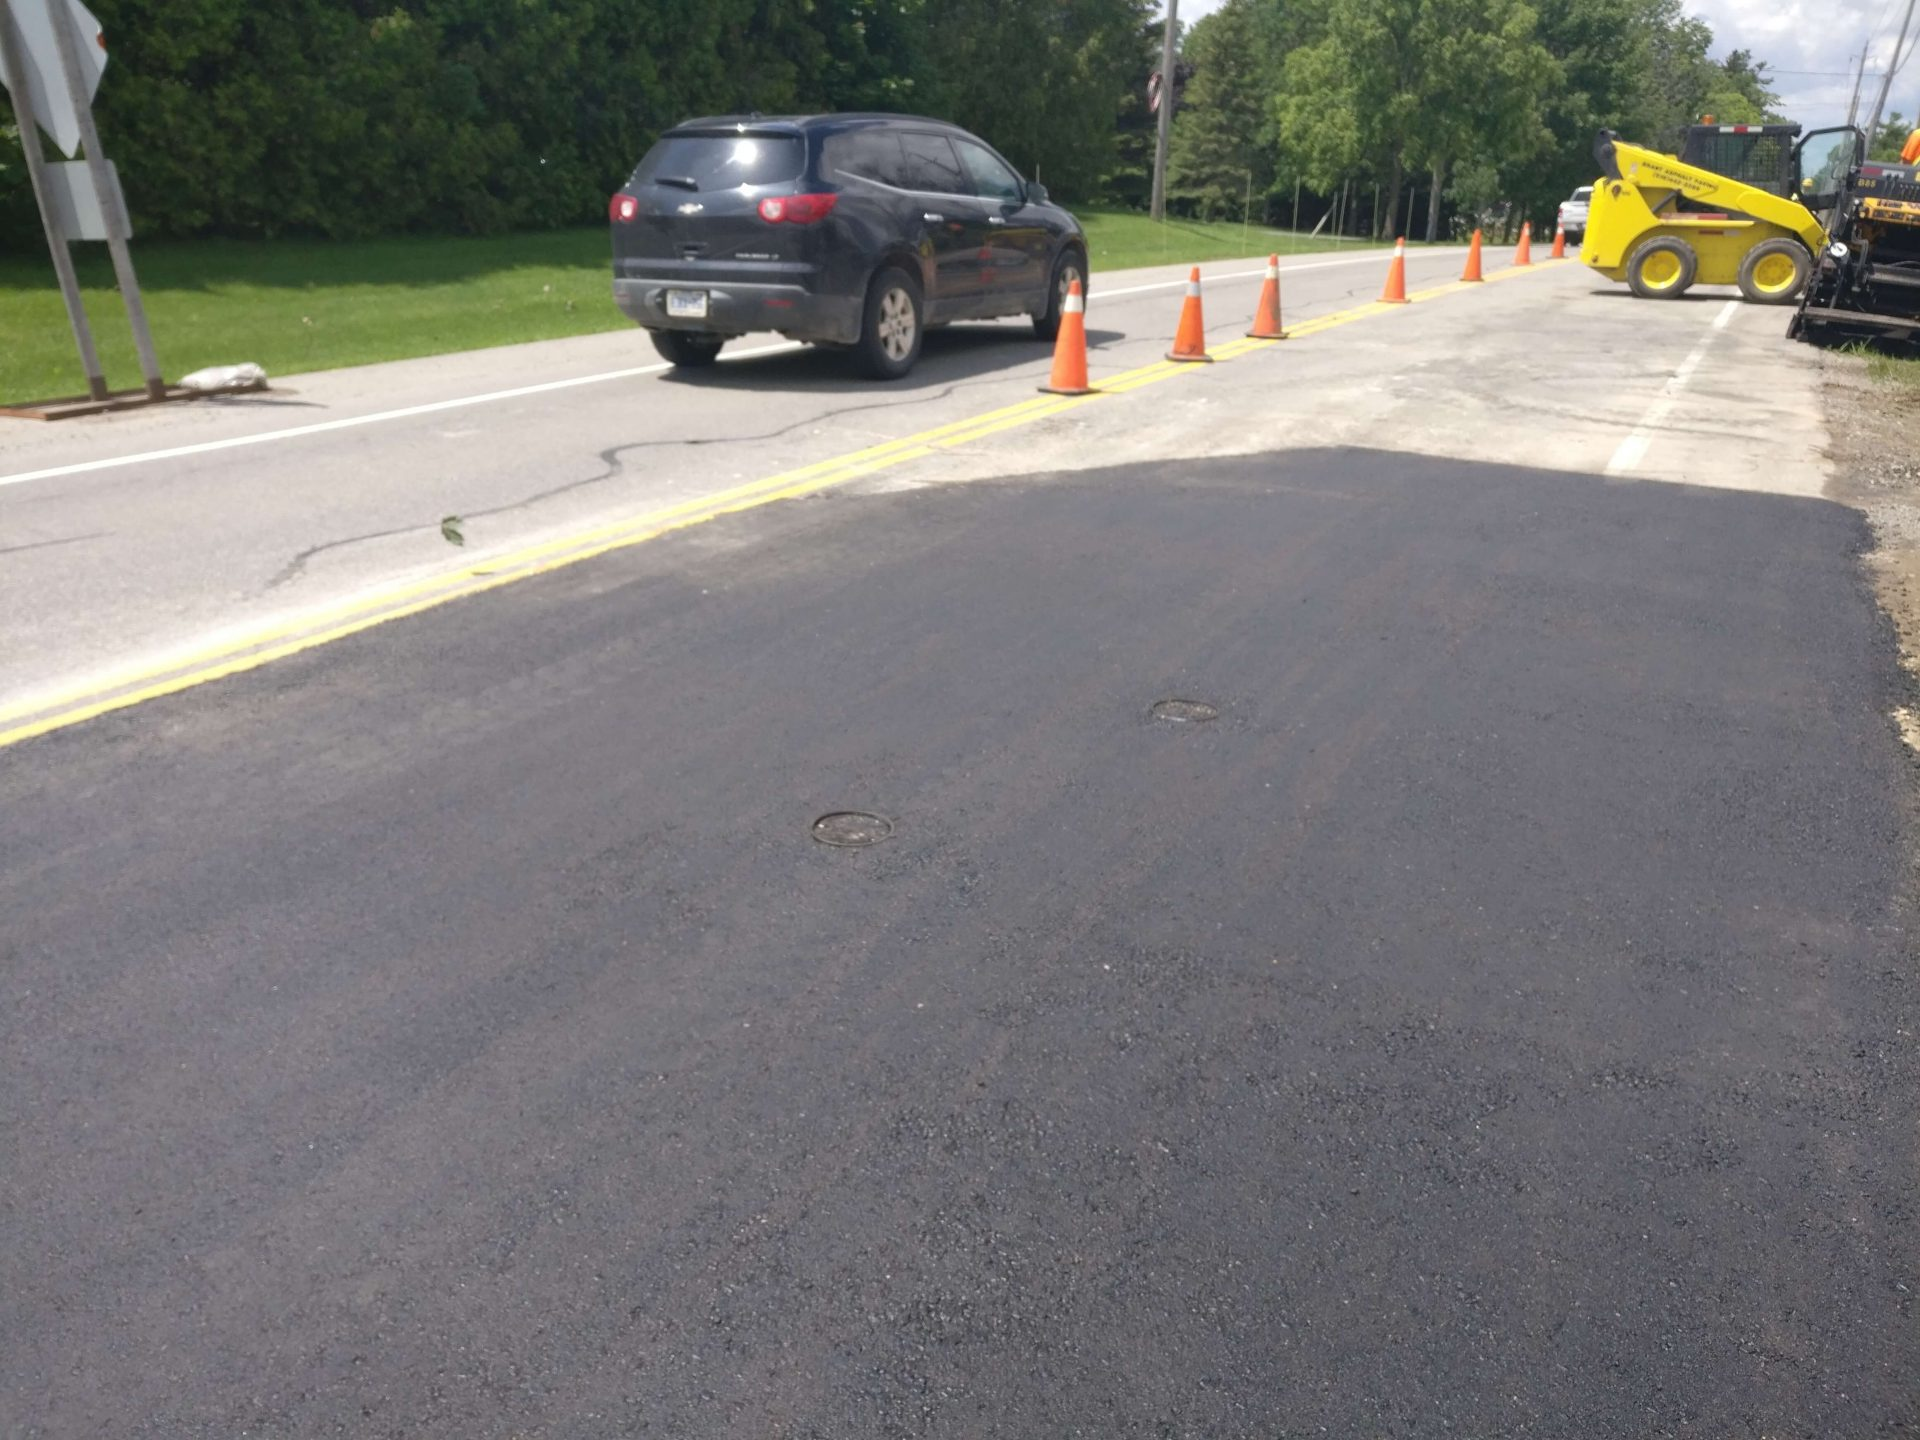 Paved comparison to regular concrete roads